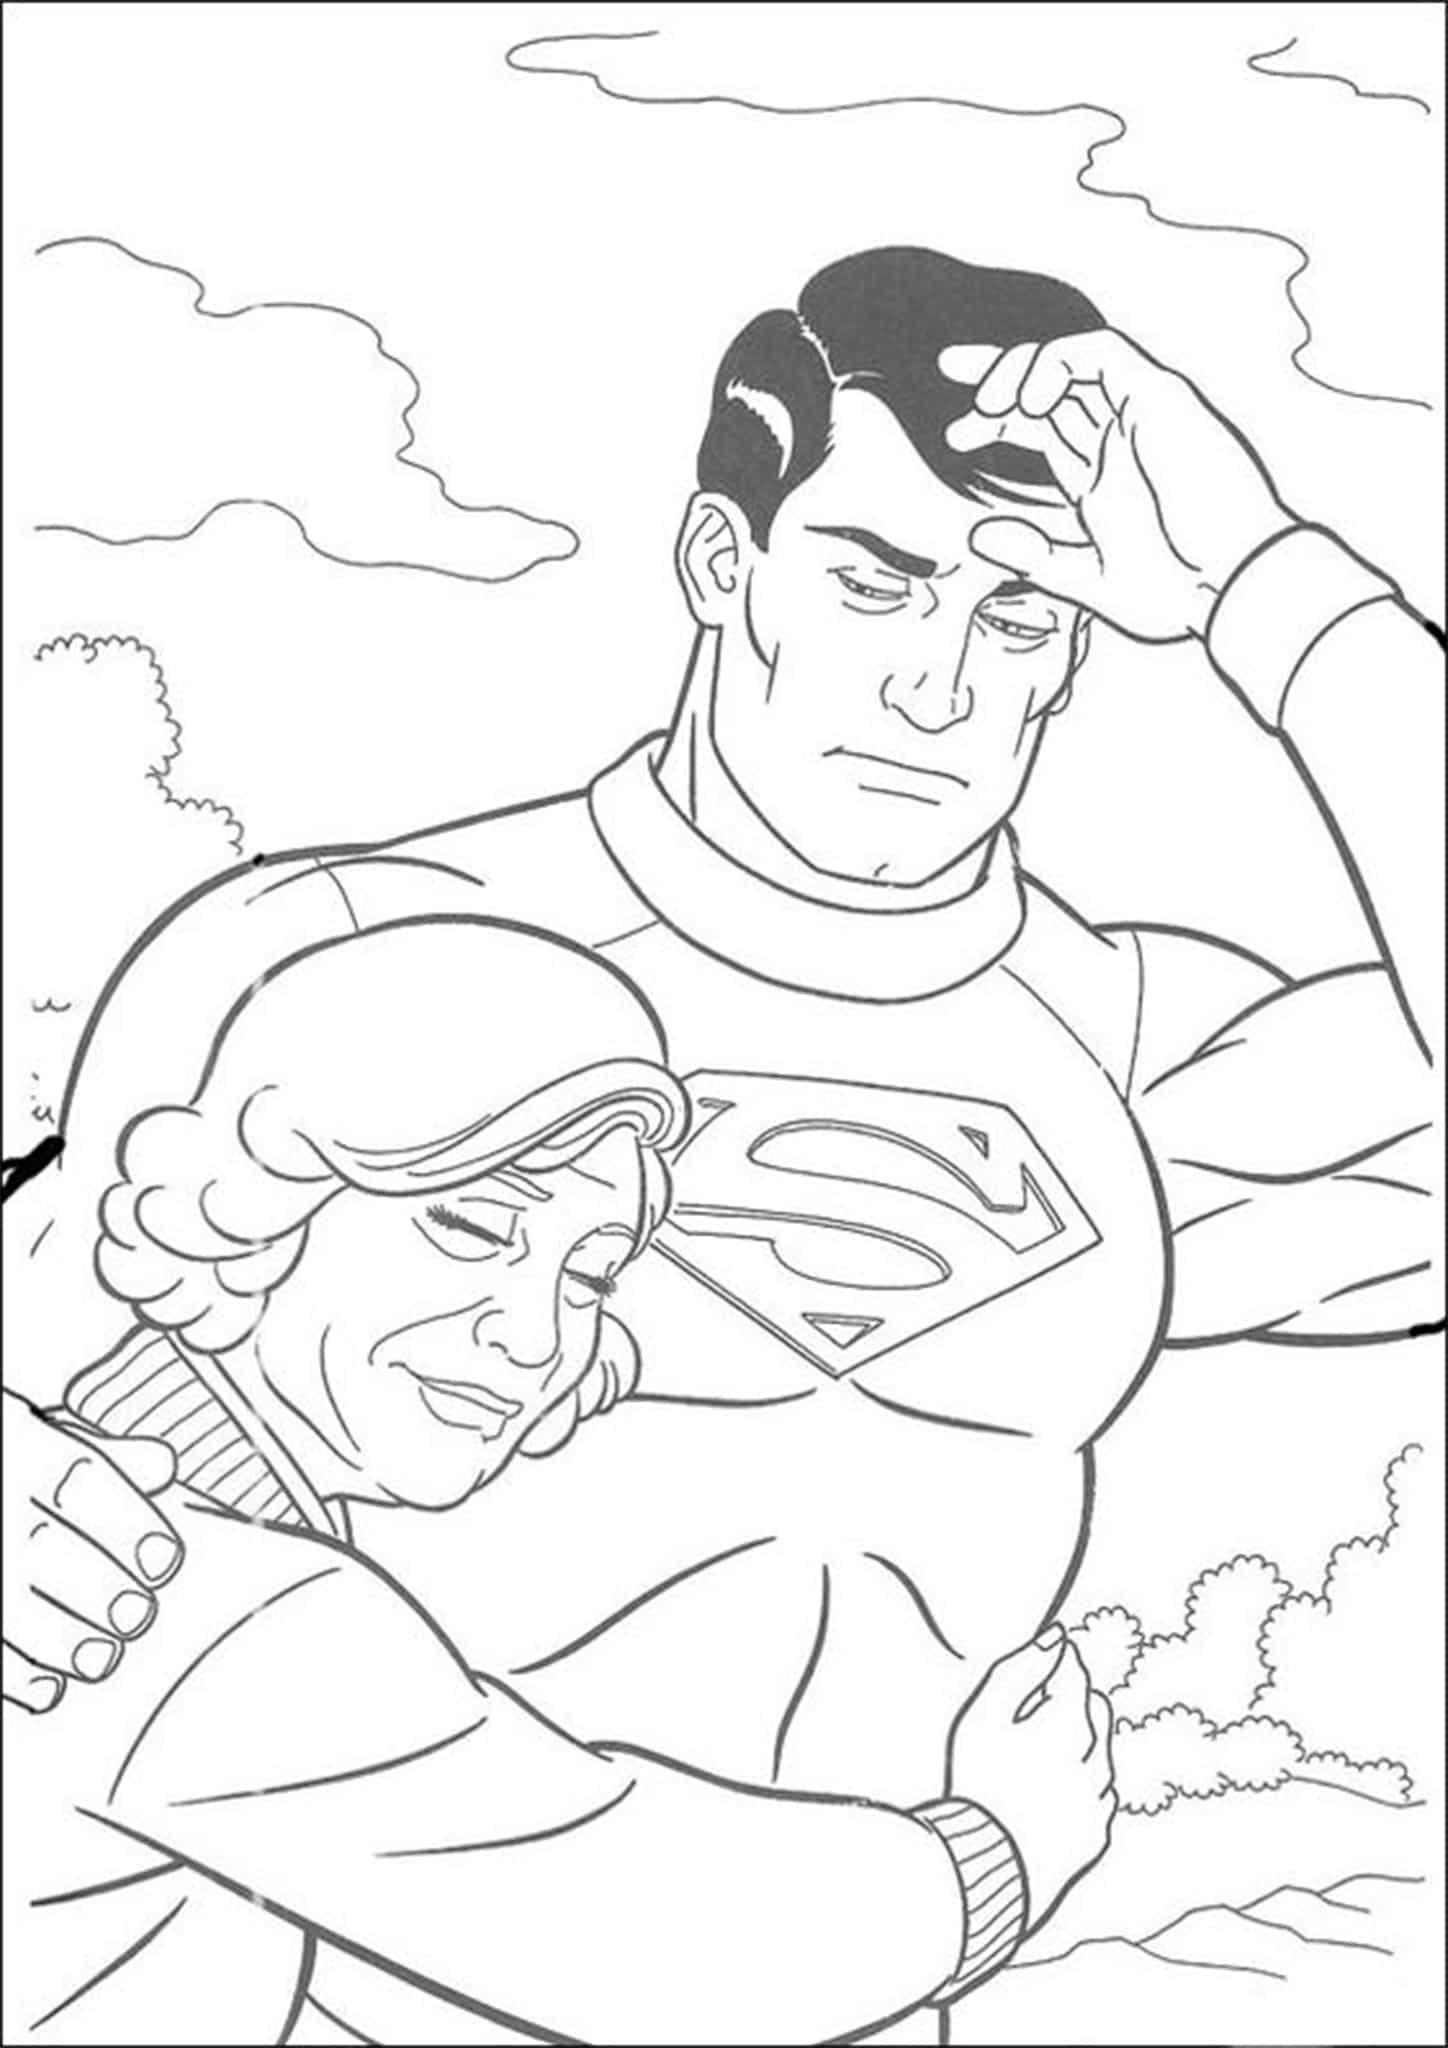 Granny Hugging The Superman